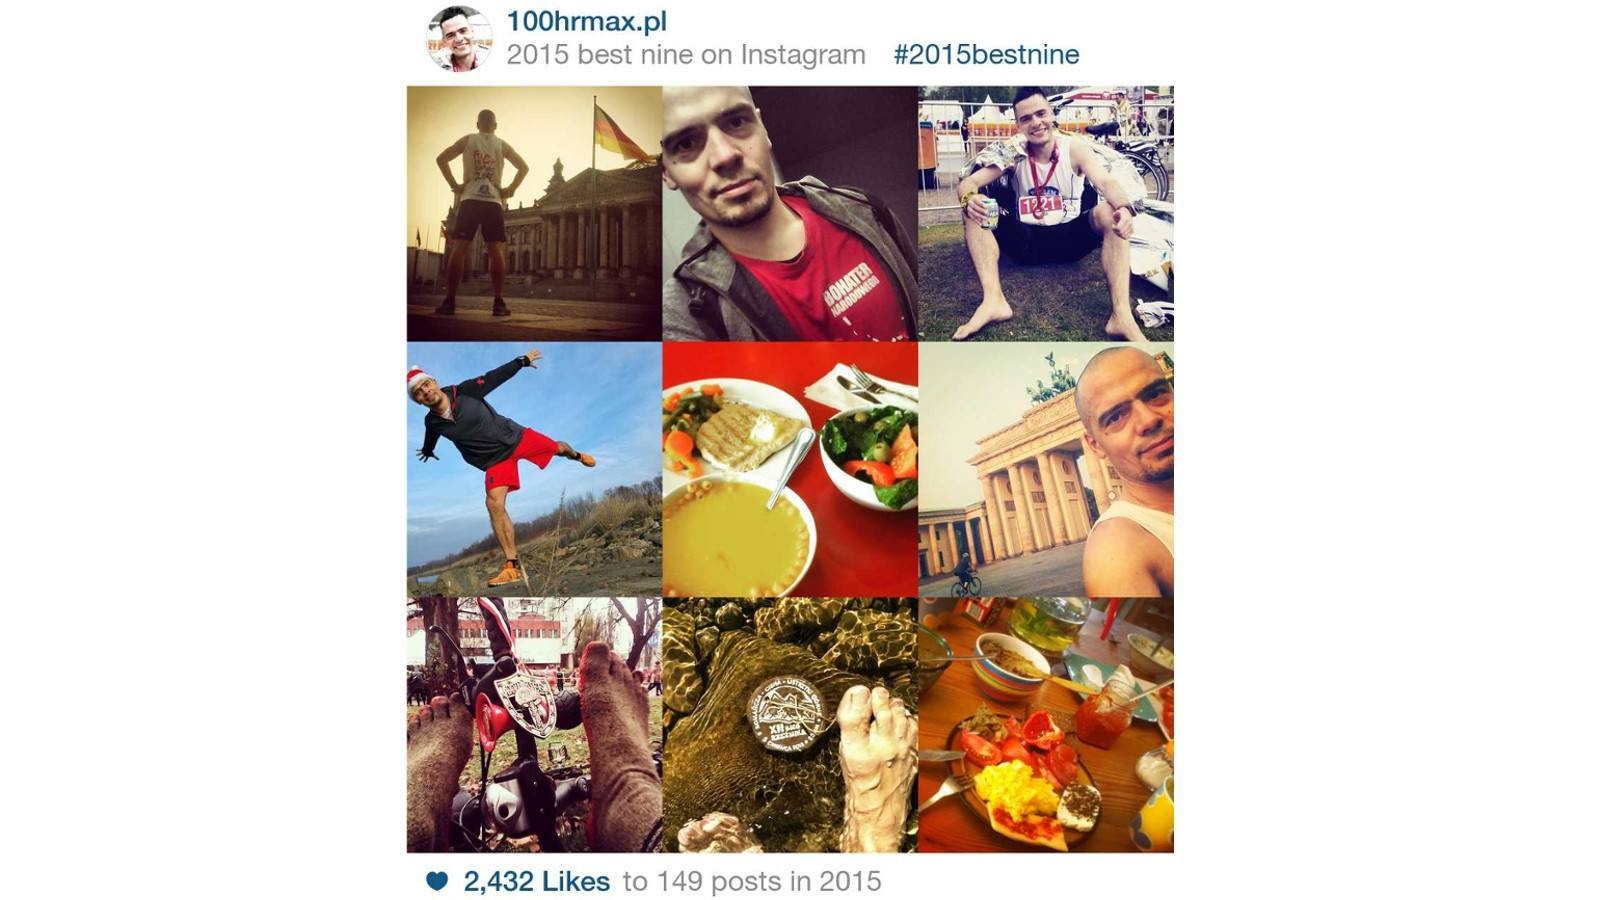 Zapraszam: http://instagram.com/100hrmax.pl